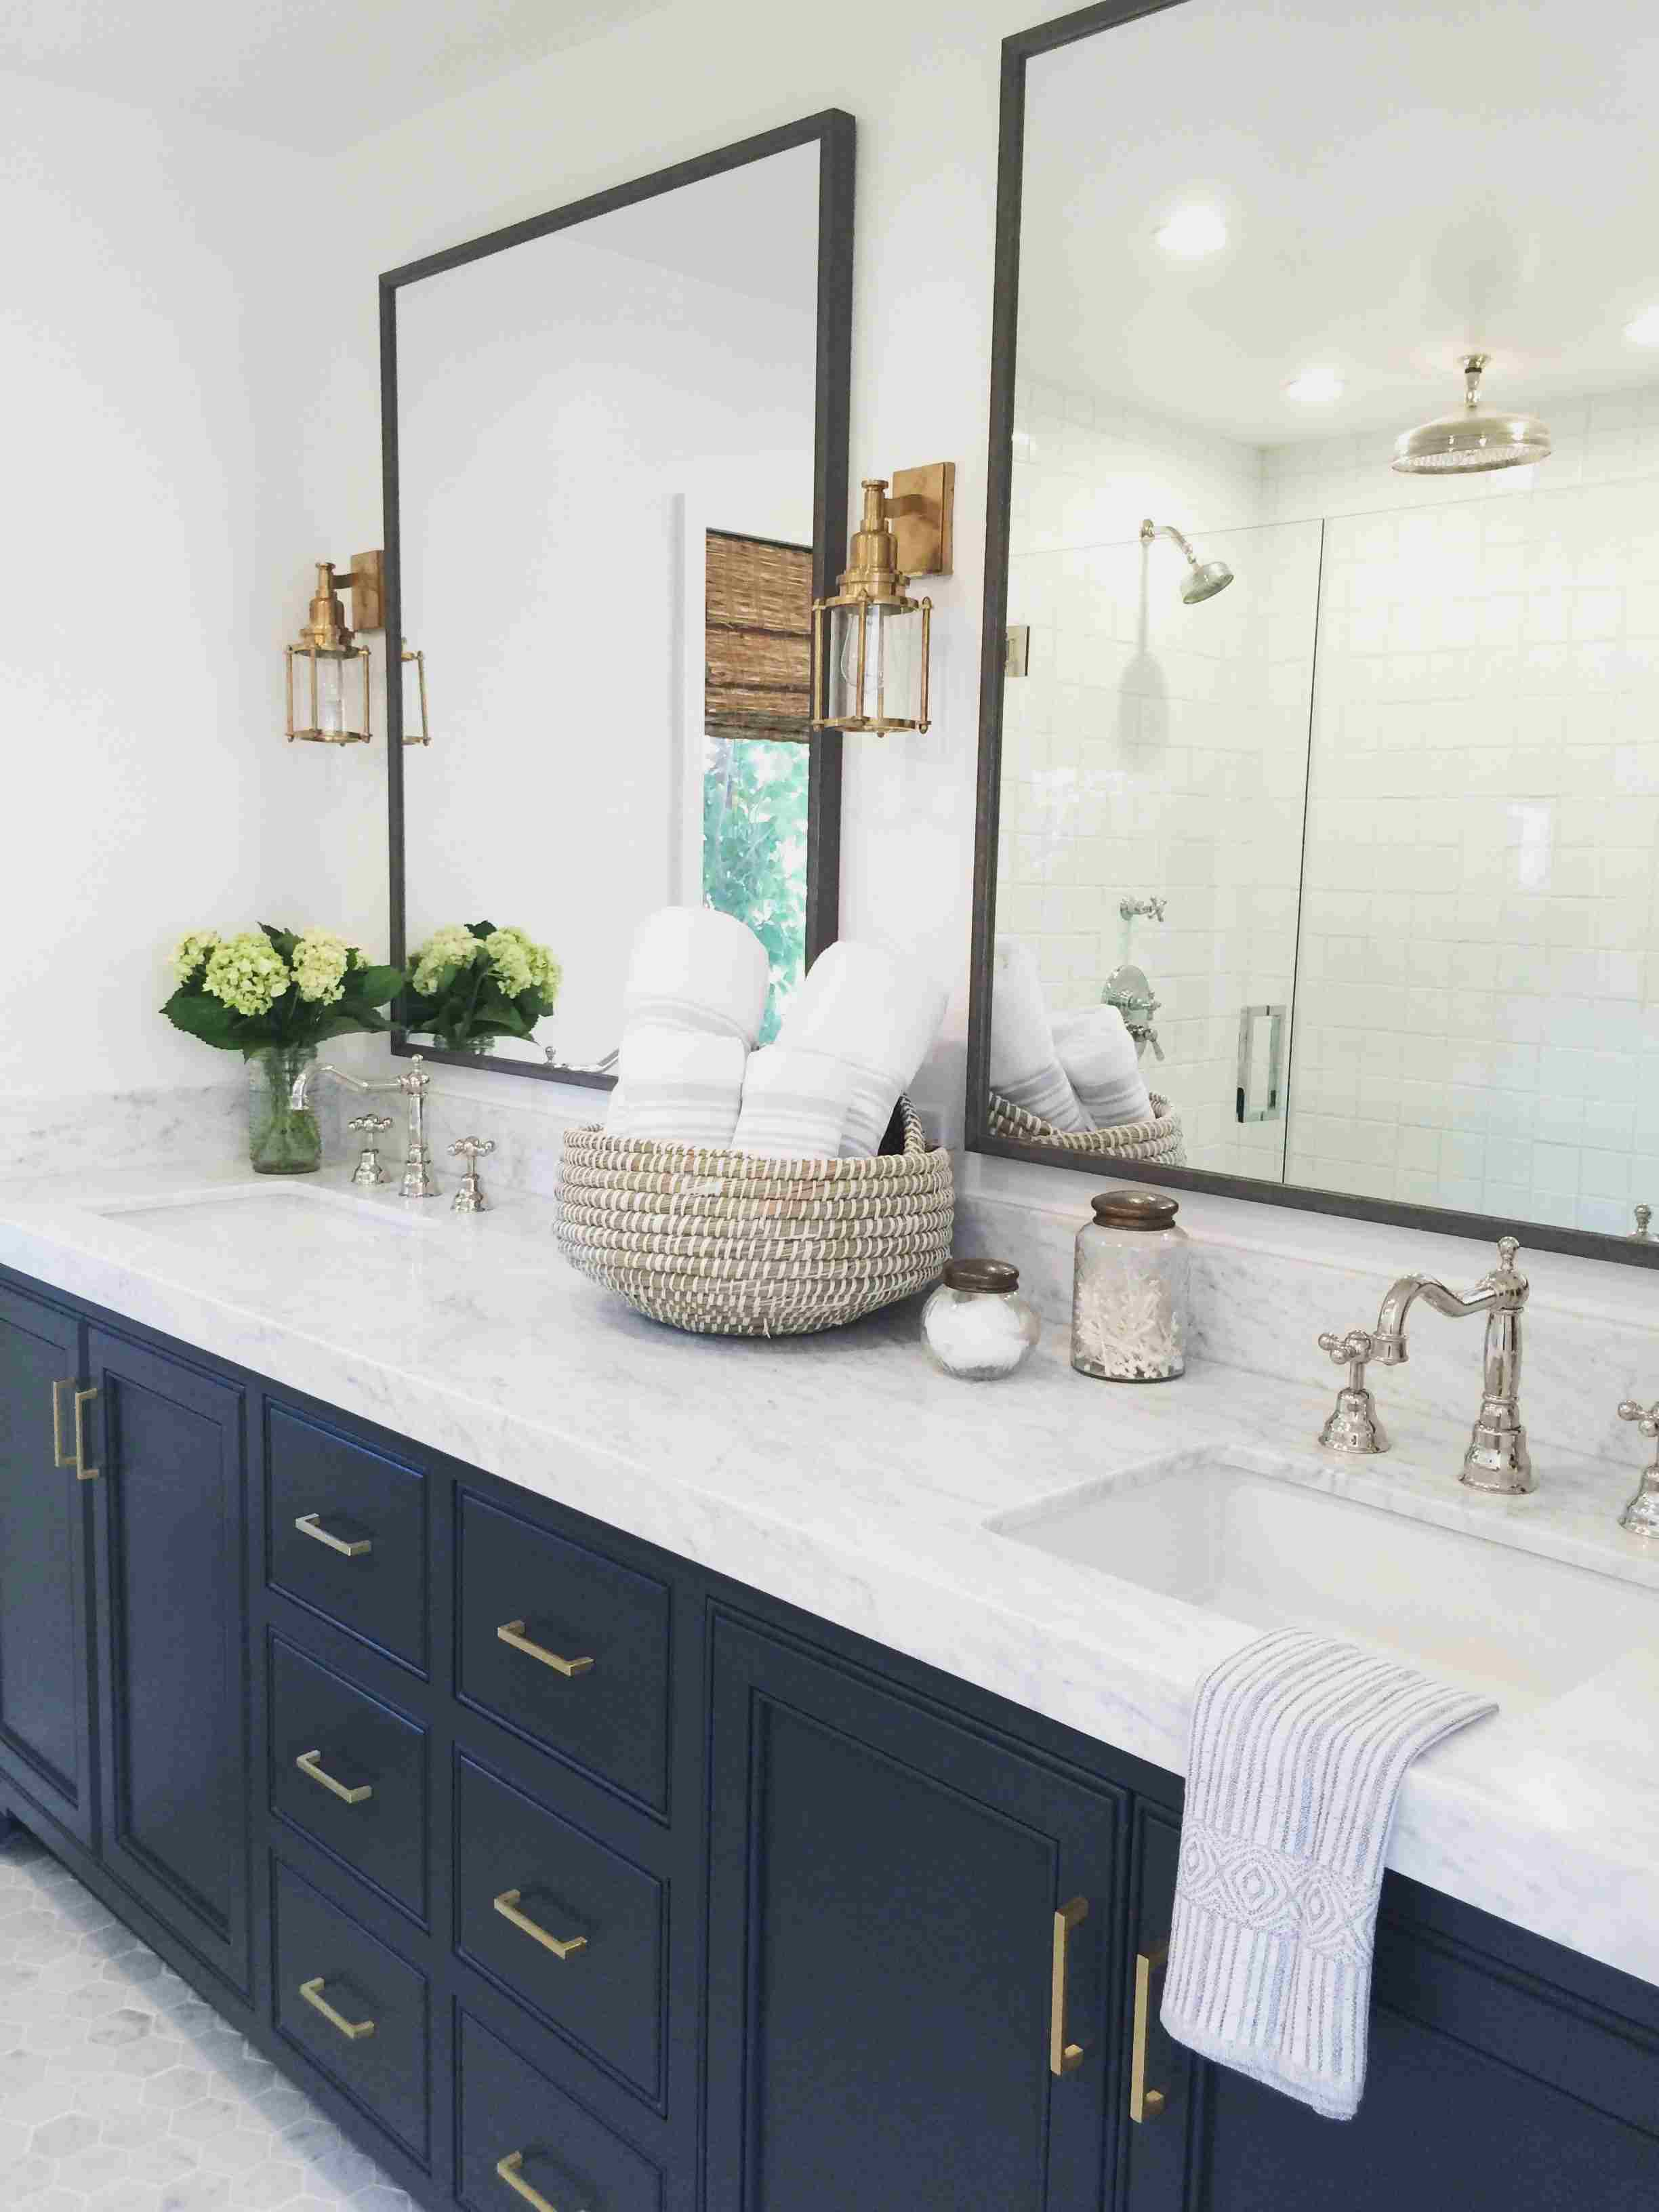 Navy Blue Cabinets In Bathroom - Bathroom Design Ideas